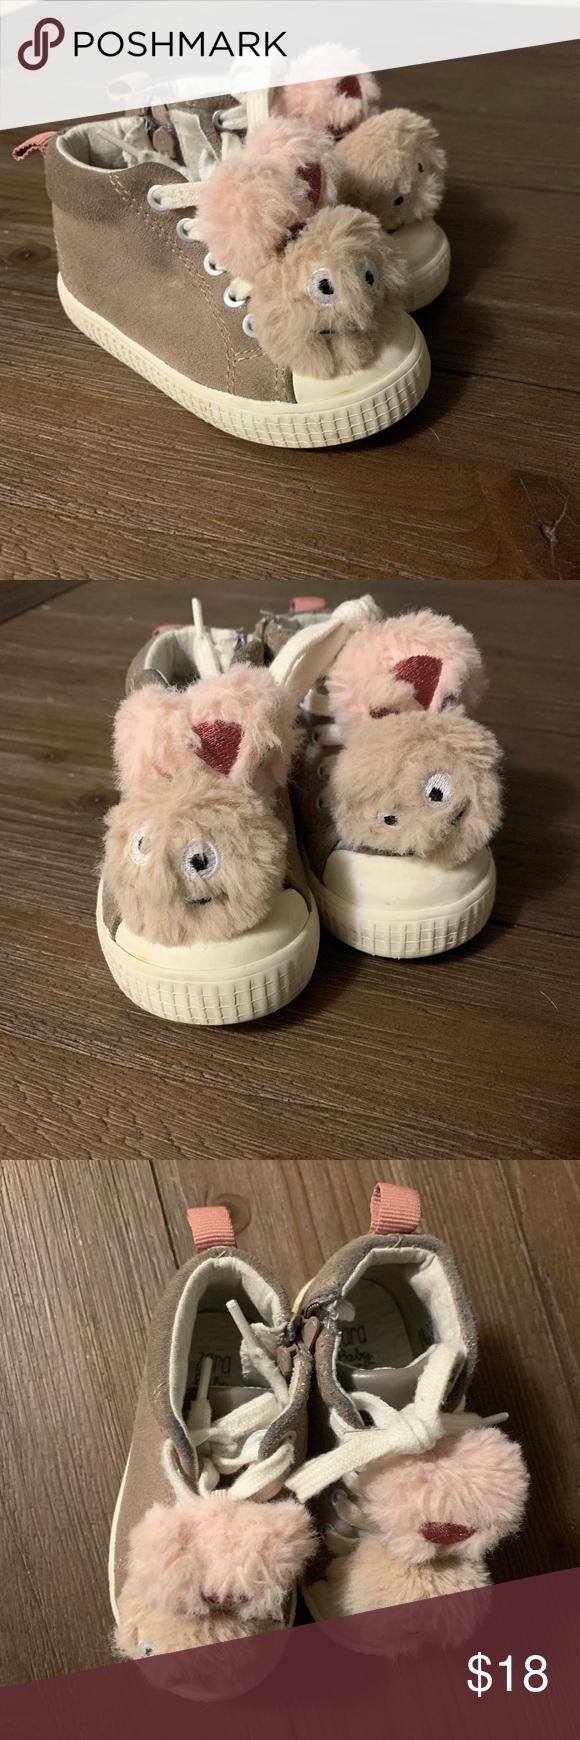 Zara baby shoes size 20 | Baby shoes, Zara baby, Baby shoe ...